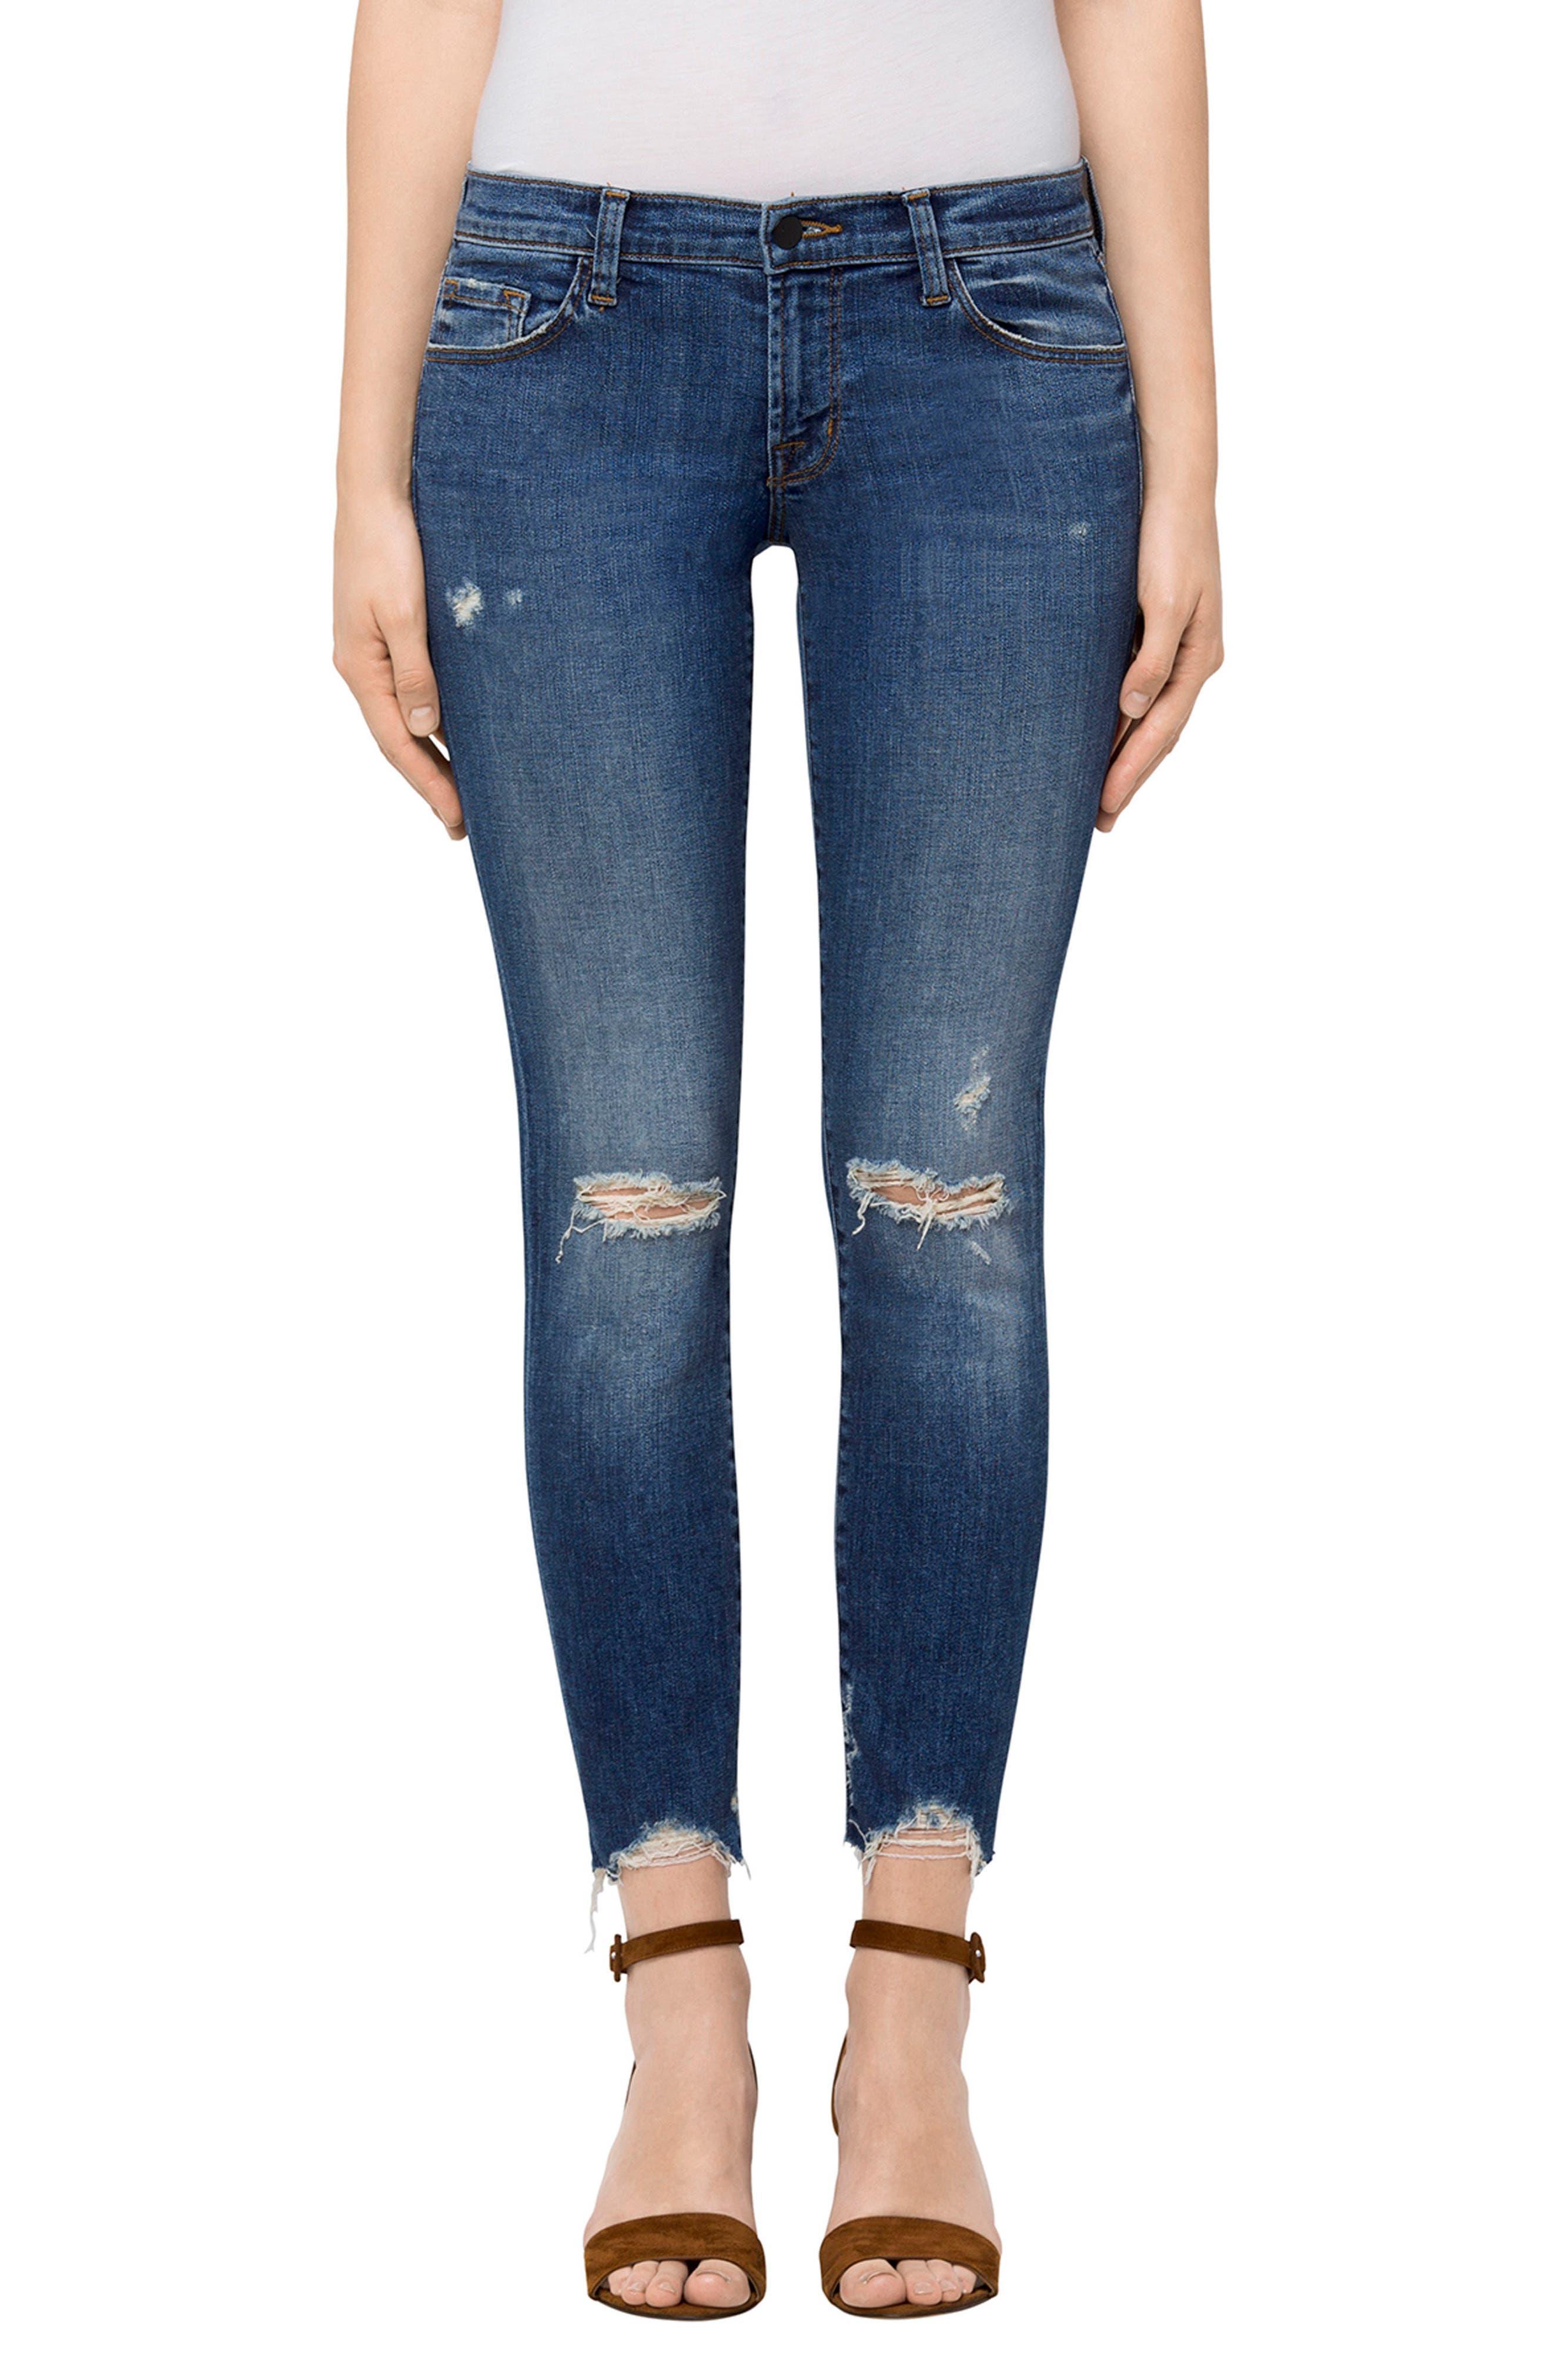 9326 Low Rise Crop Skinny Jeans,                             Main thumbnail 1, color,                             435